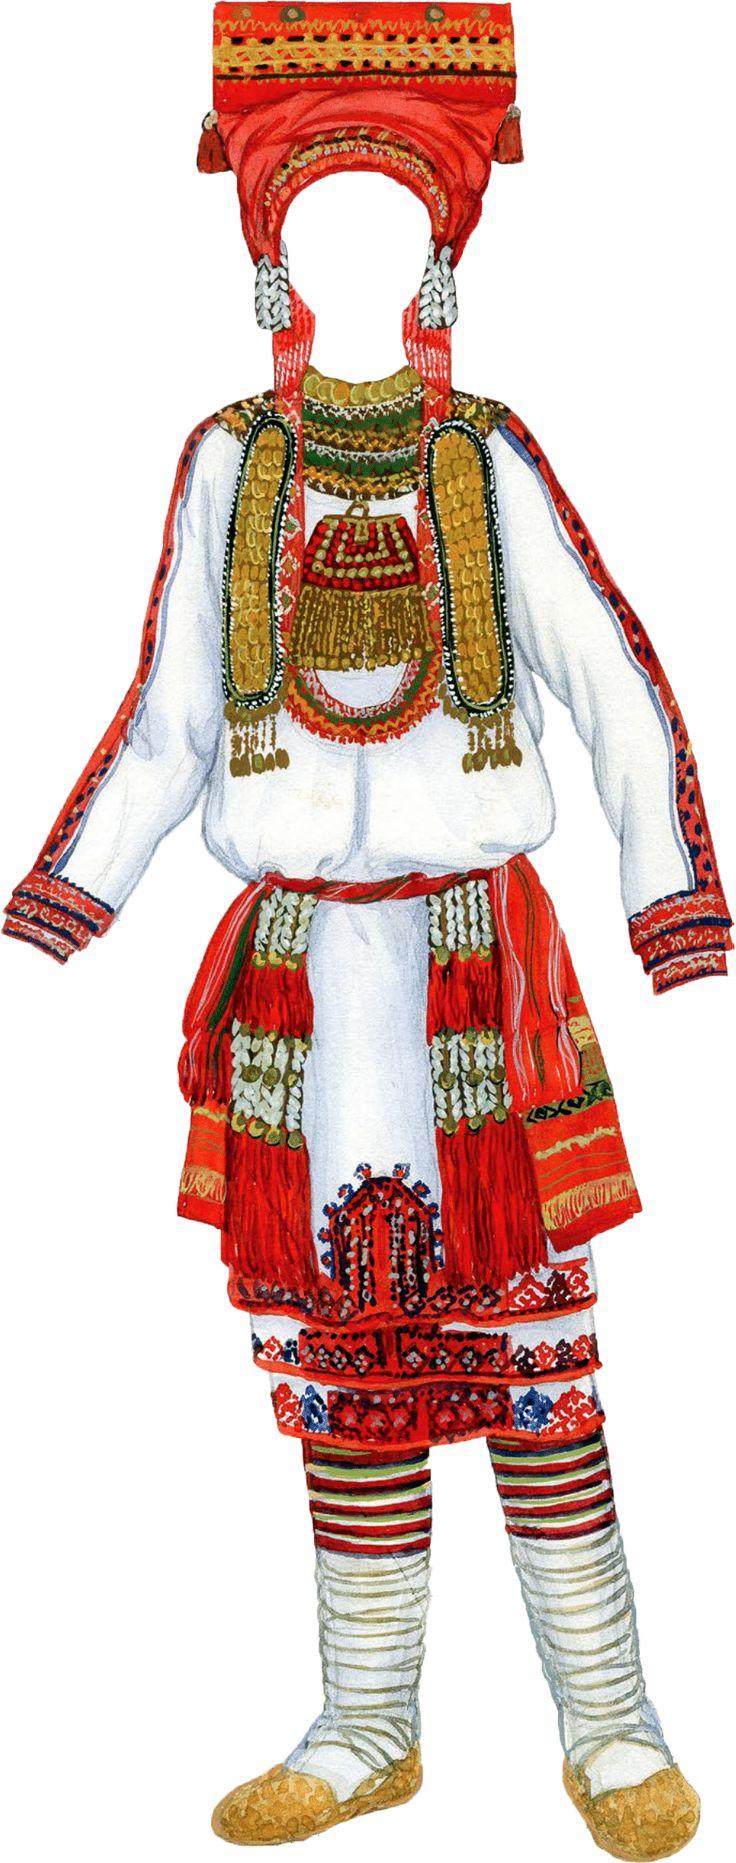 Картинка мордовского костюма